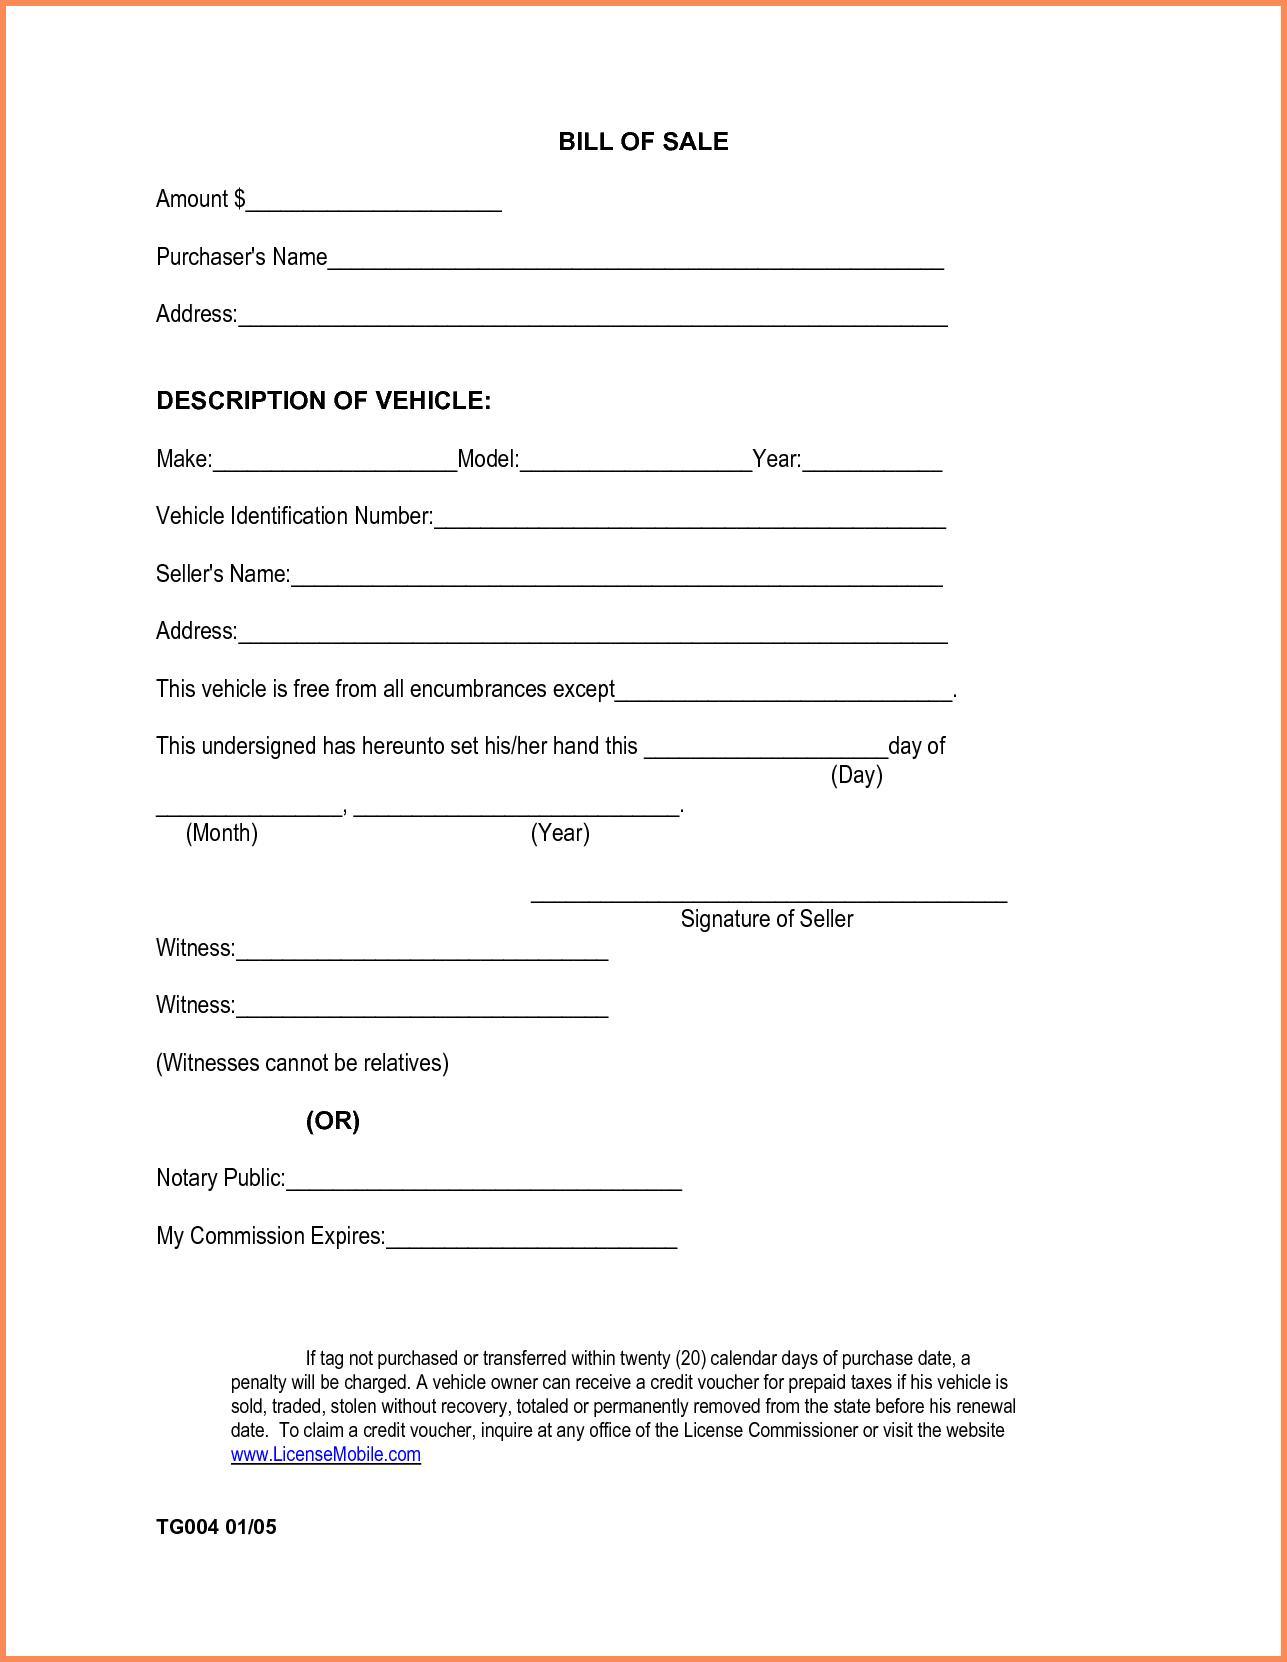 Bill Of Sale Template Alabama and Generic Bill Of Sale for Carabama Vehicle Bill Sale form